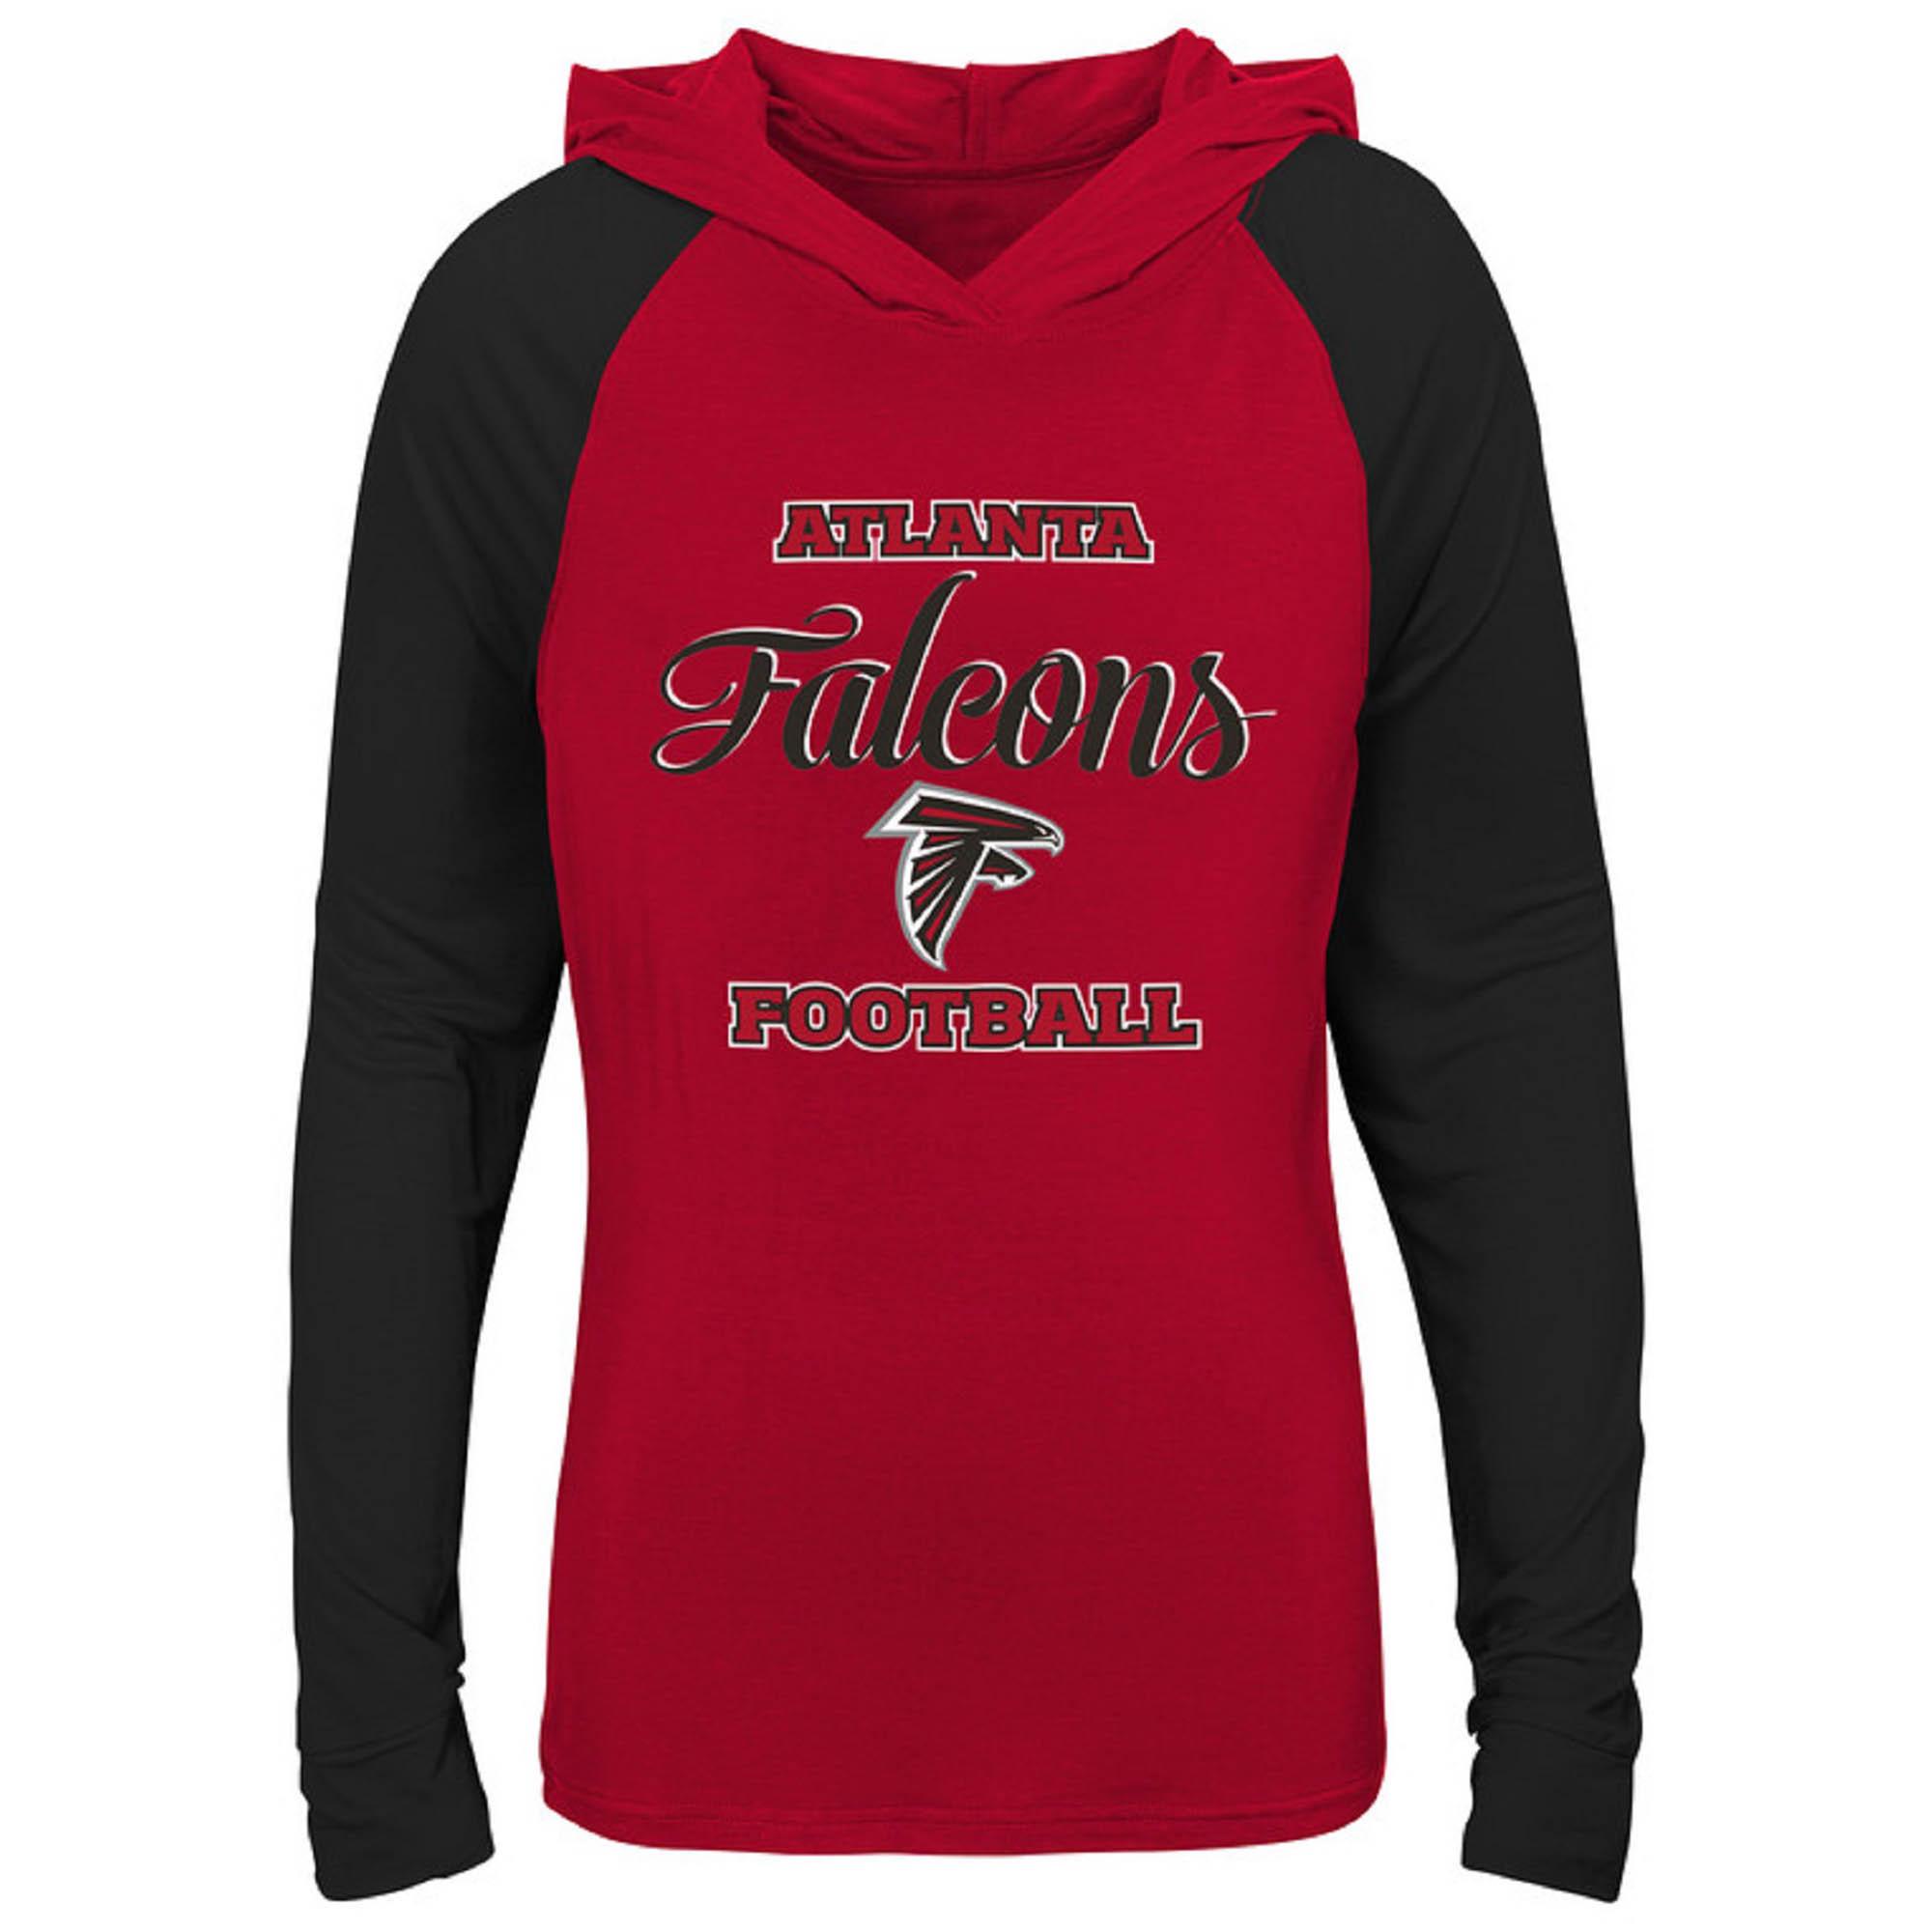 Girls Youth Red/Black Atlanta Falcons Hooded Long Sleeve T-Shirt